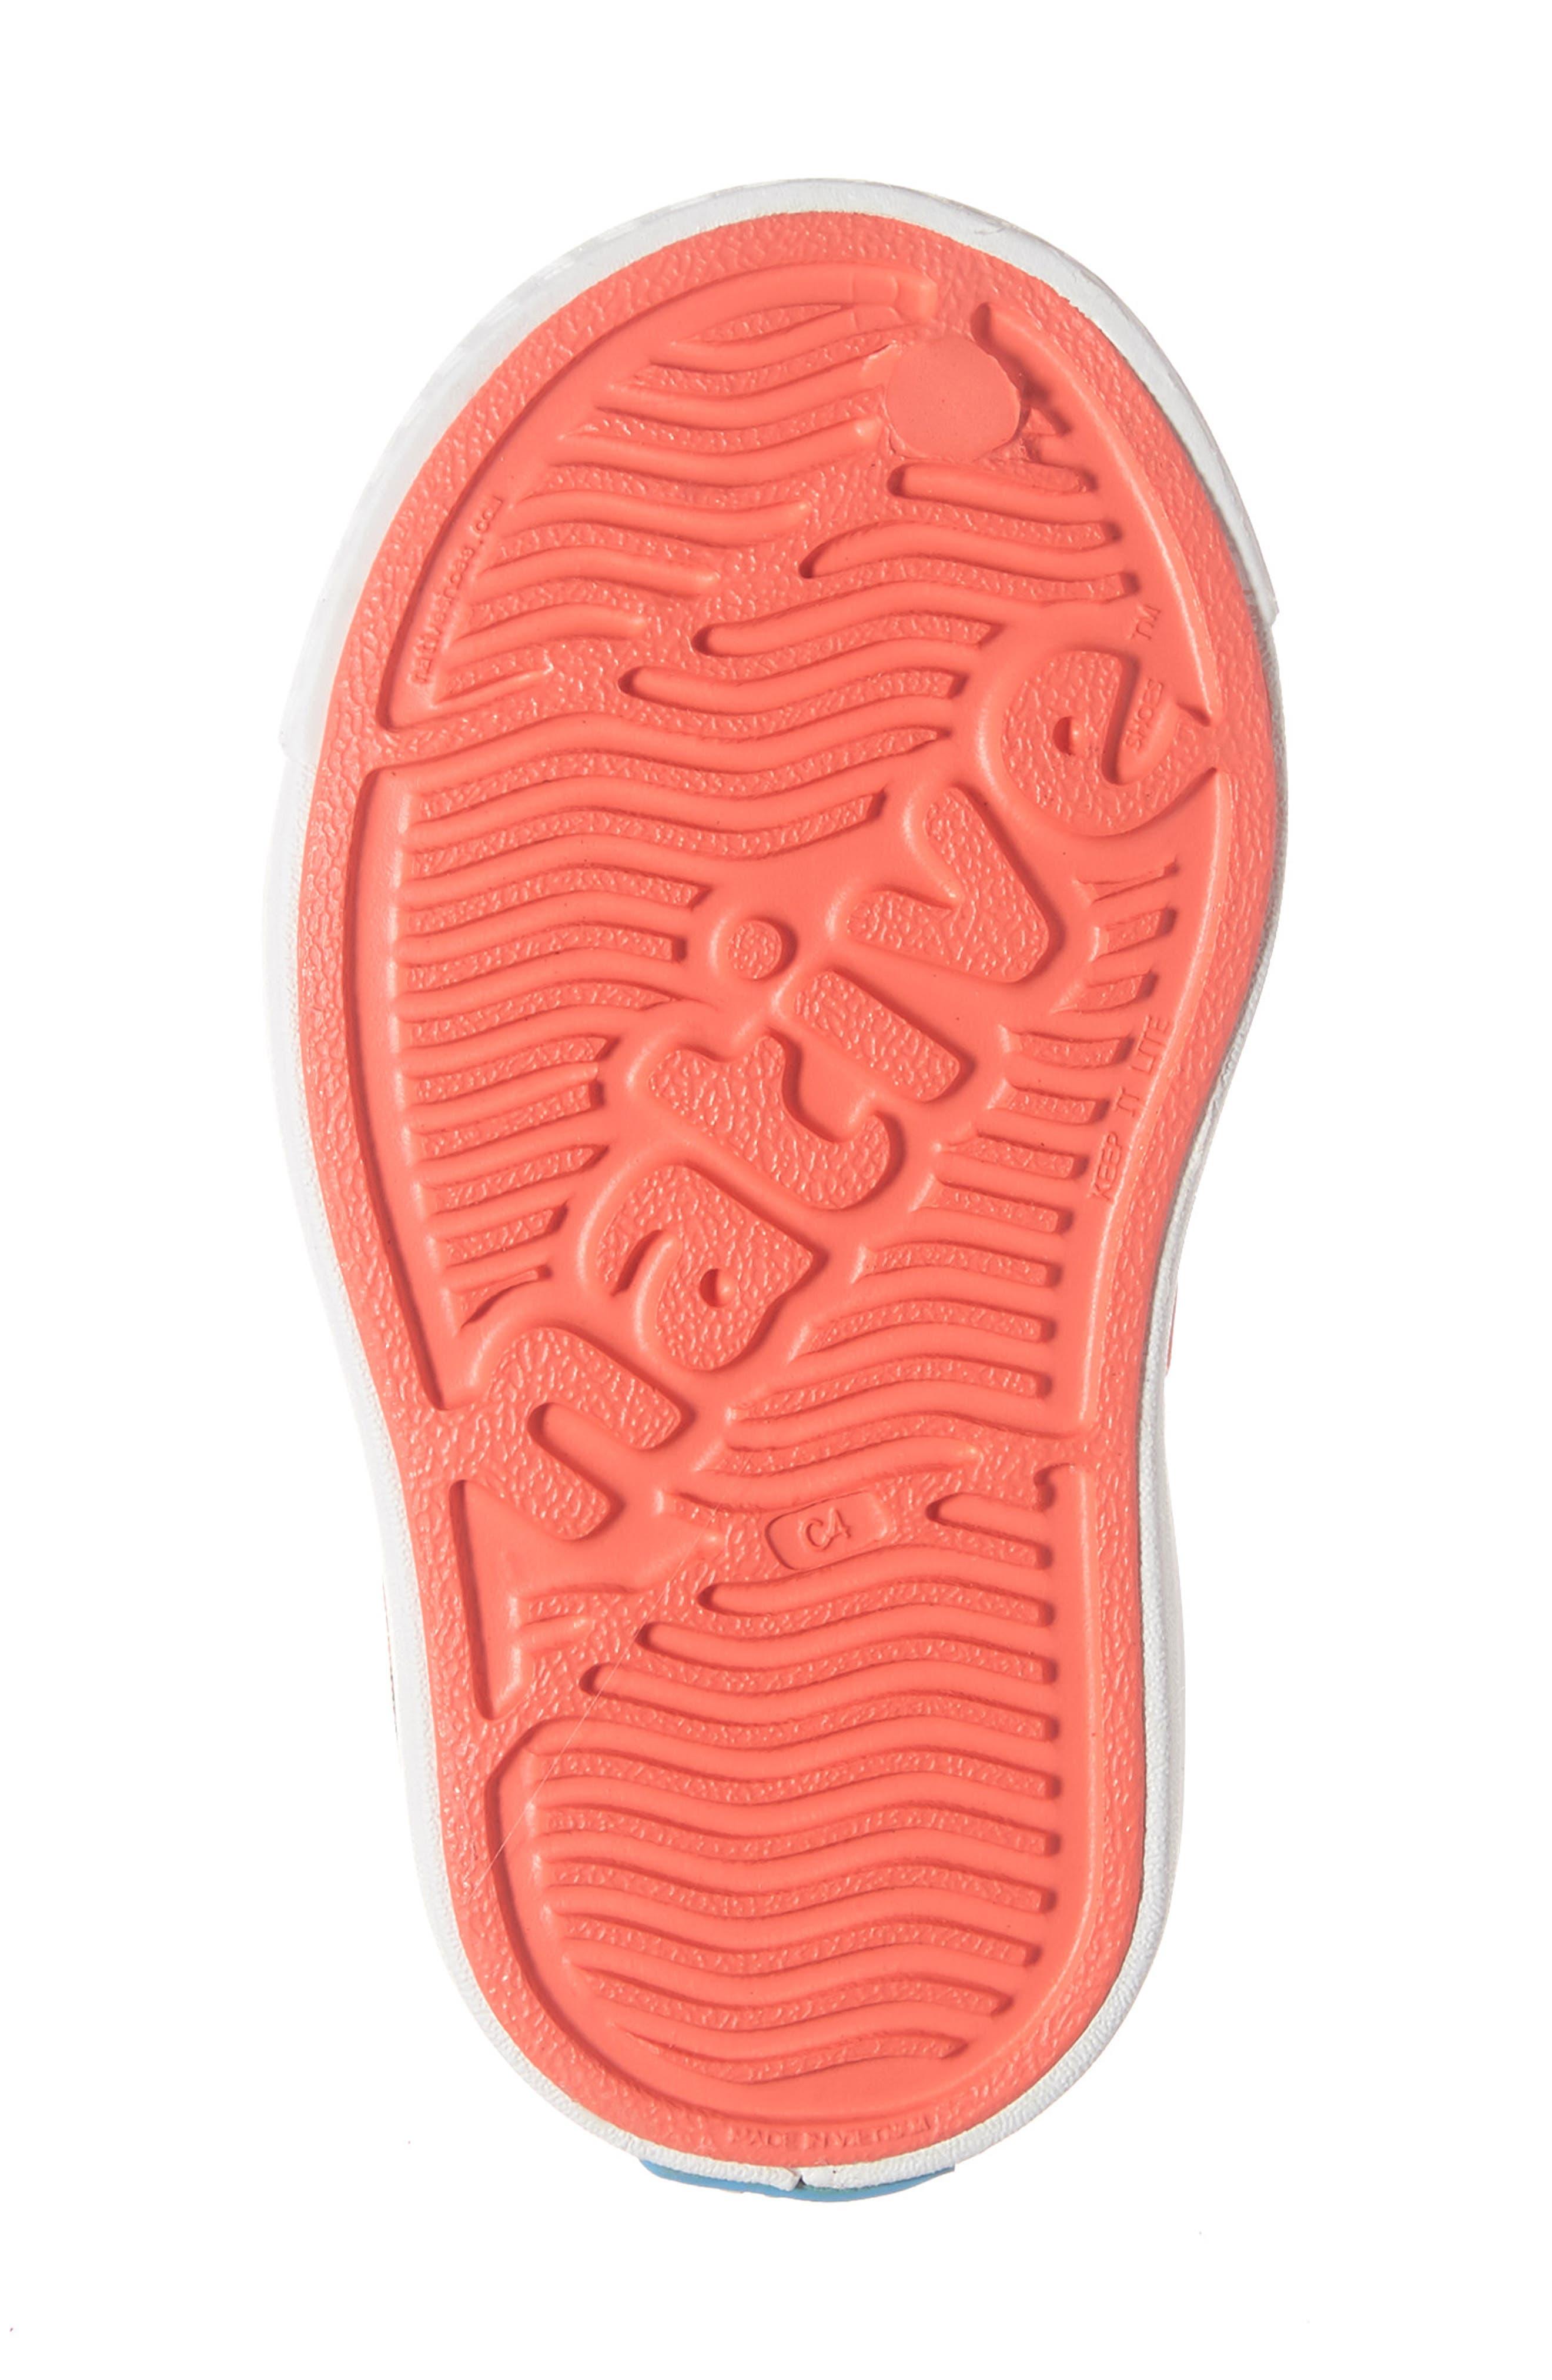 Jefferson Pineapple Print Water Friendly Sneaker,                             Alternate thumbnail 6, color,                             POPSTAR PINK/ WHITE PINEAPPLES